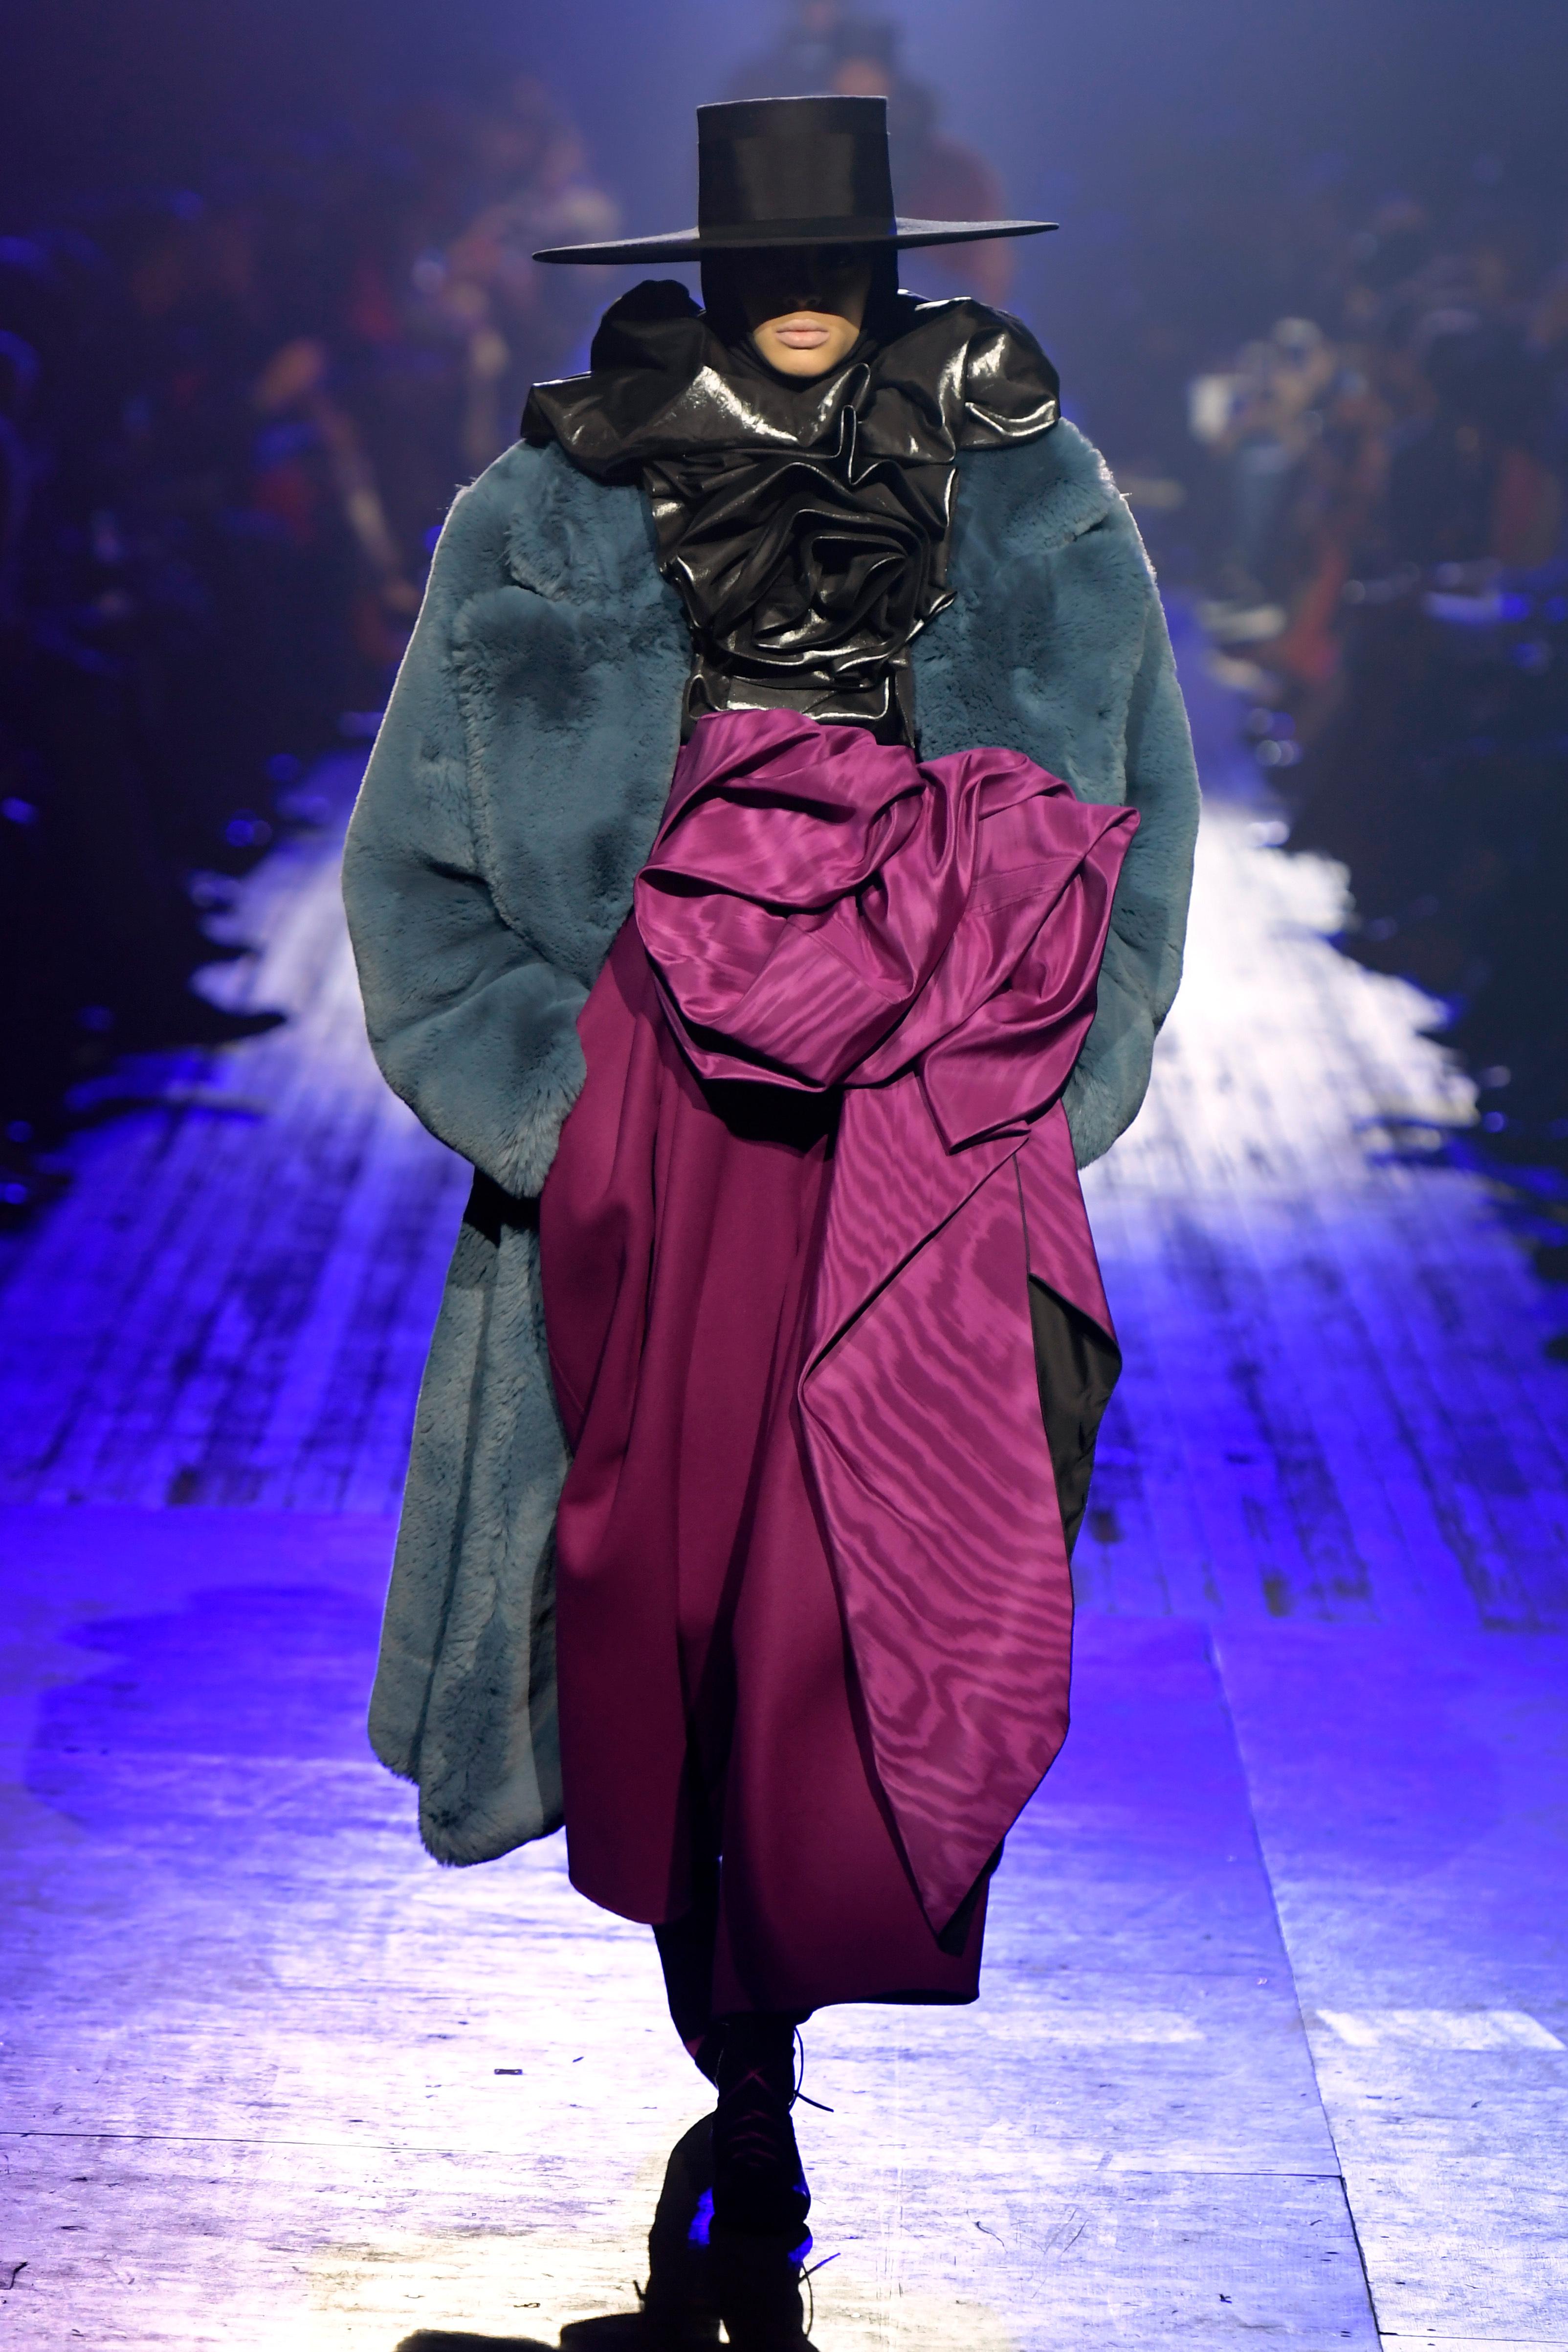 Model on the catwalkMarc Jacobs show, Runway, Fall Winter 2018, New York Fashion Week, USA - 14 Feb 2018